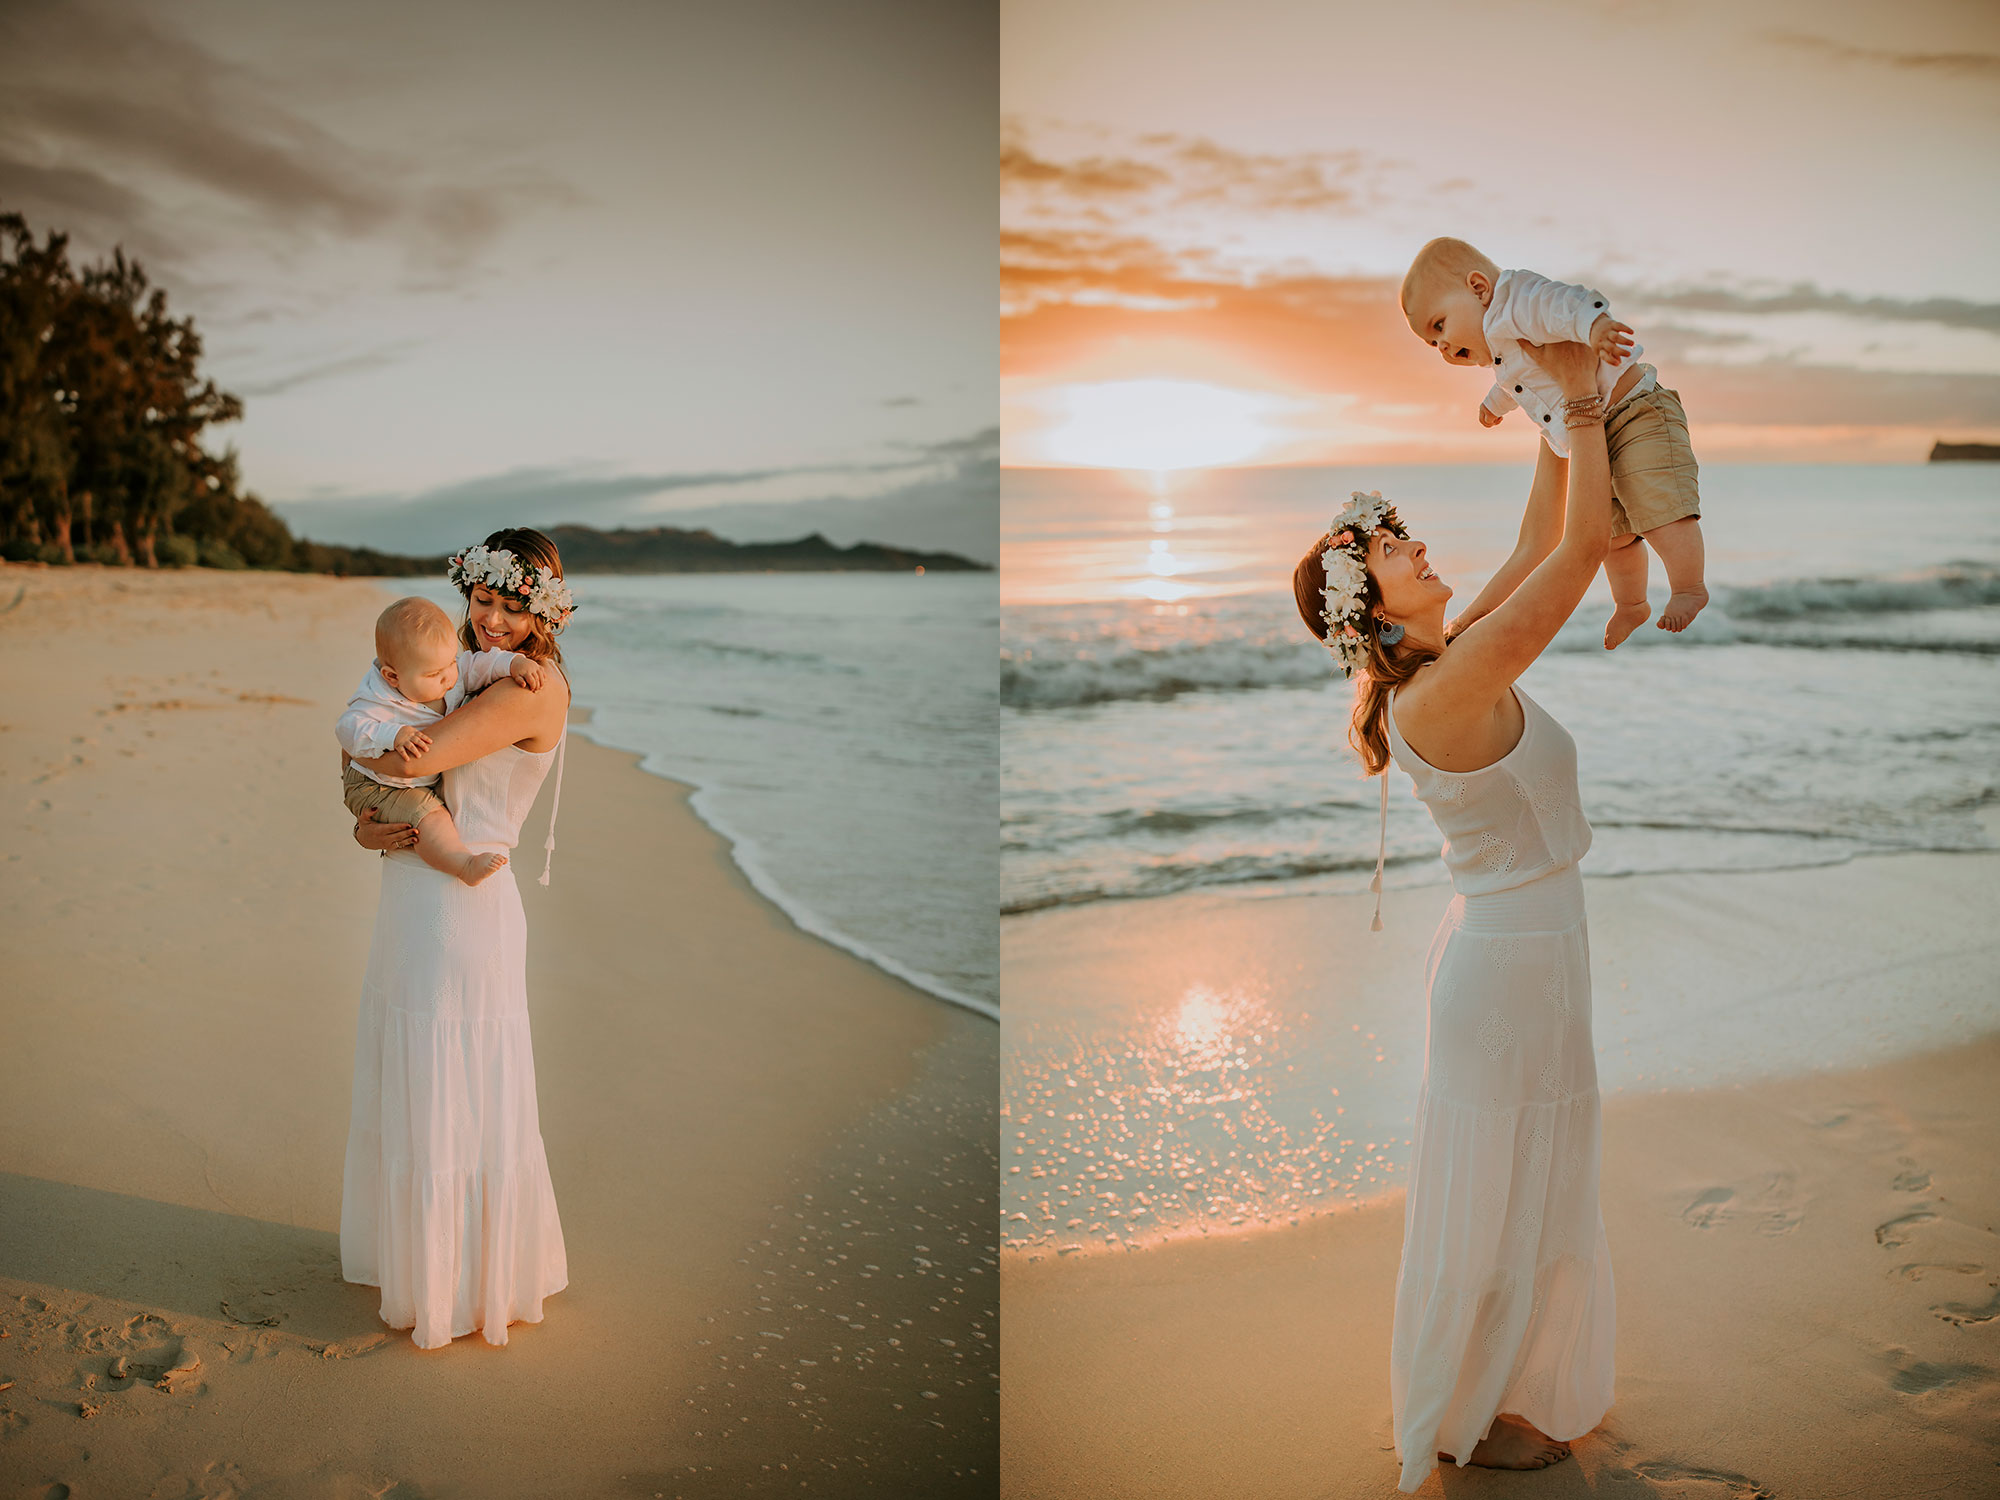 Hawaii-Oahu-Family-Photographer-07.jpg